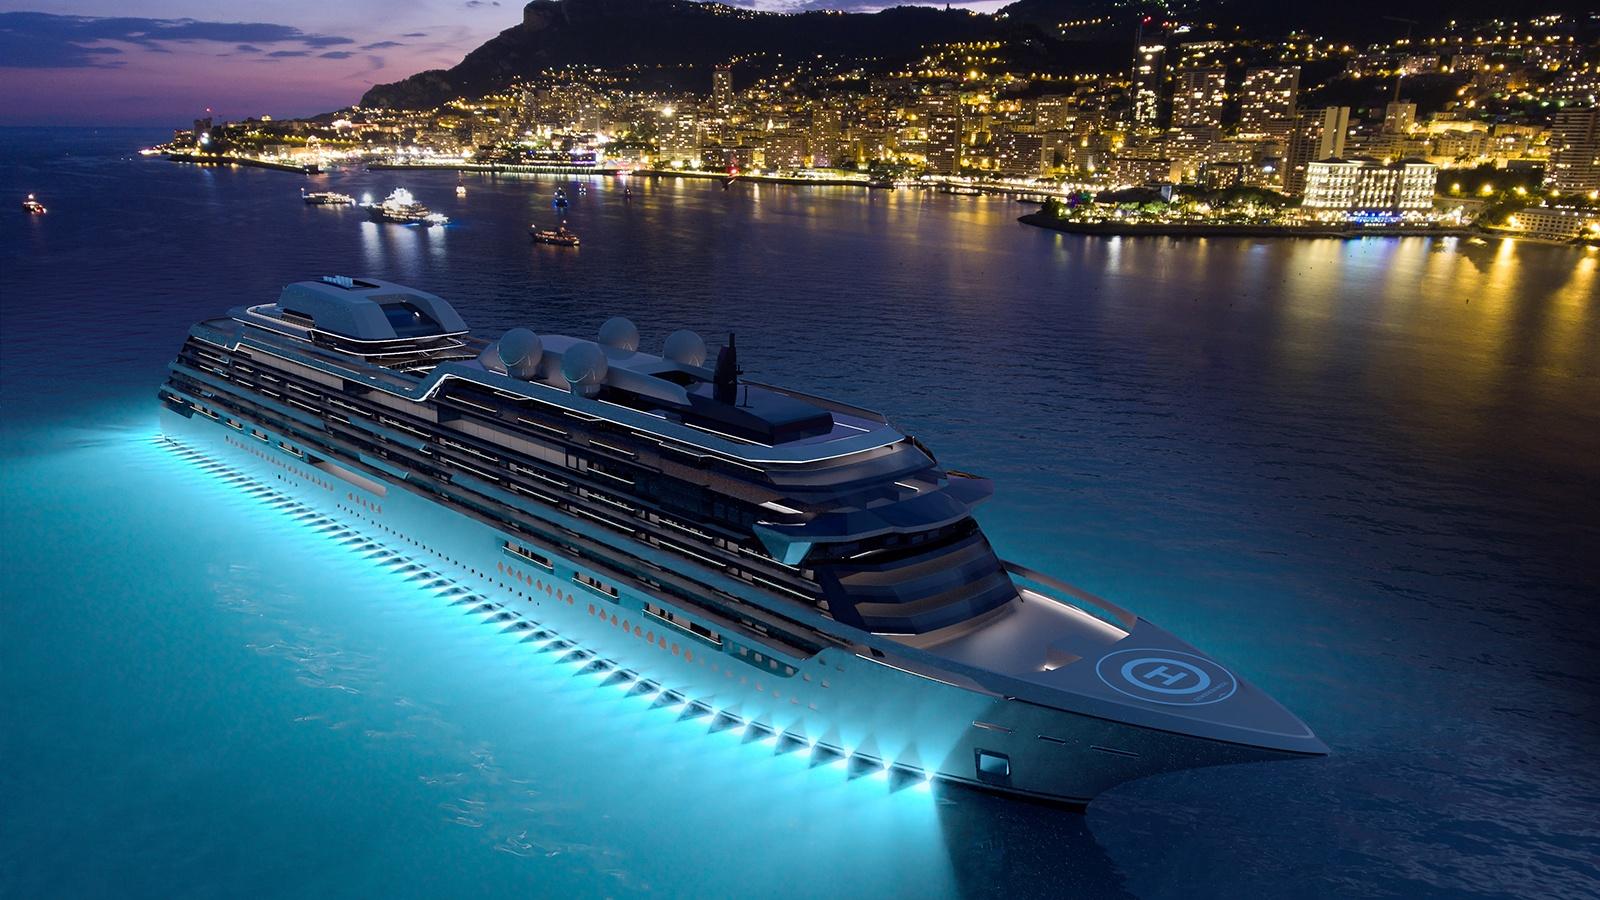 megayacht Espen Oeino cruise ship design 2560x1440